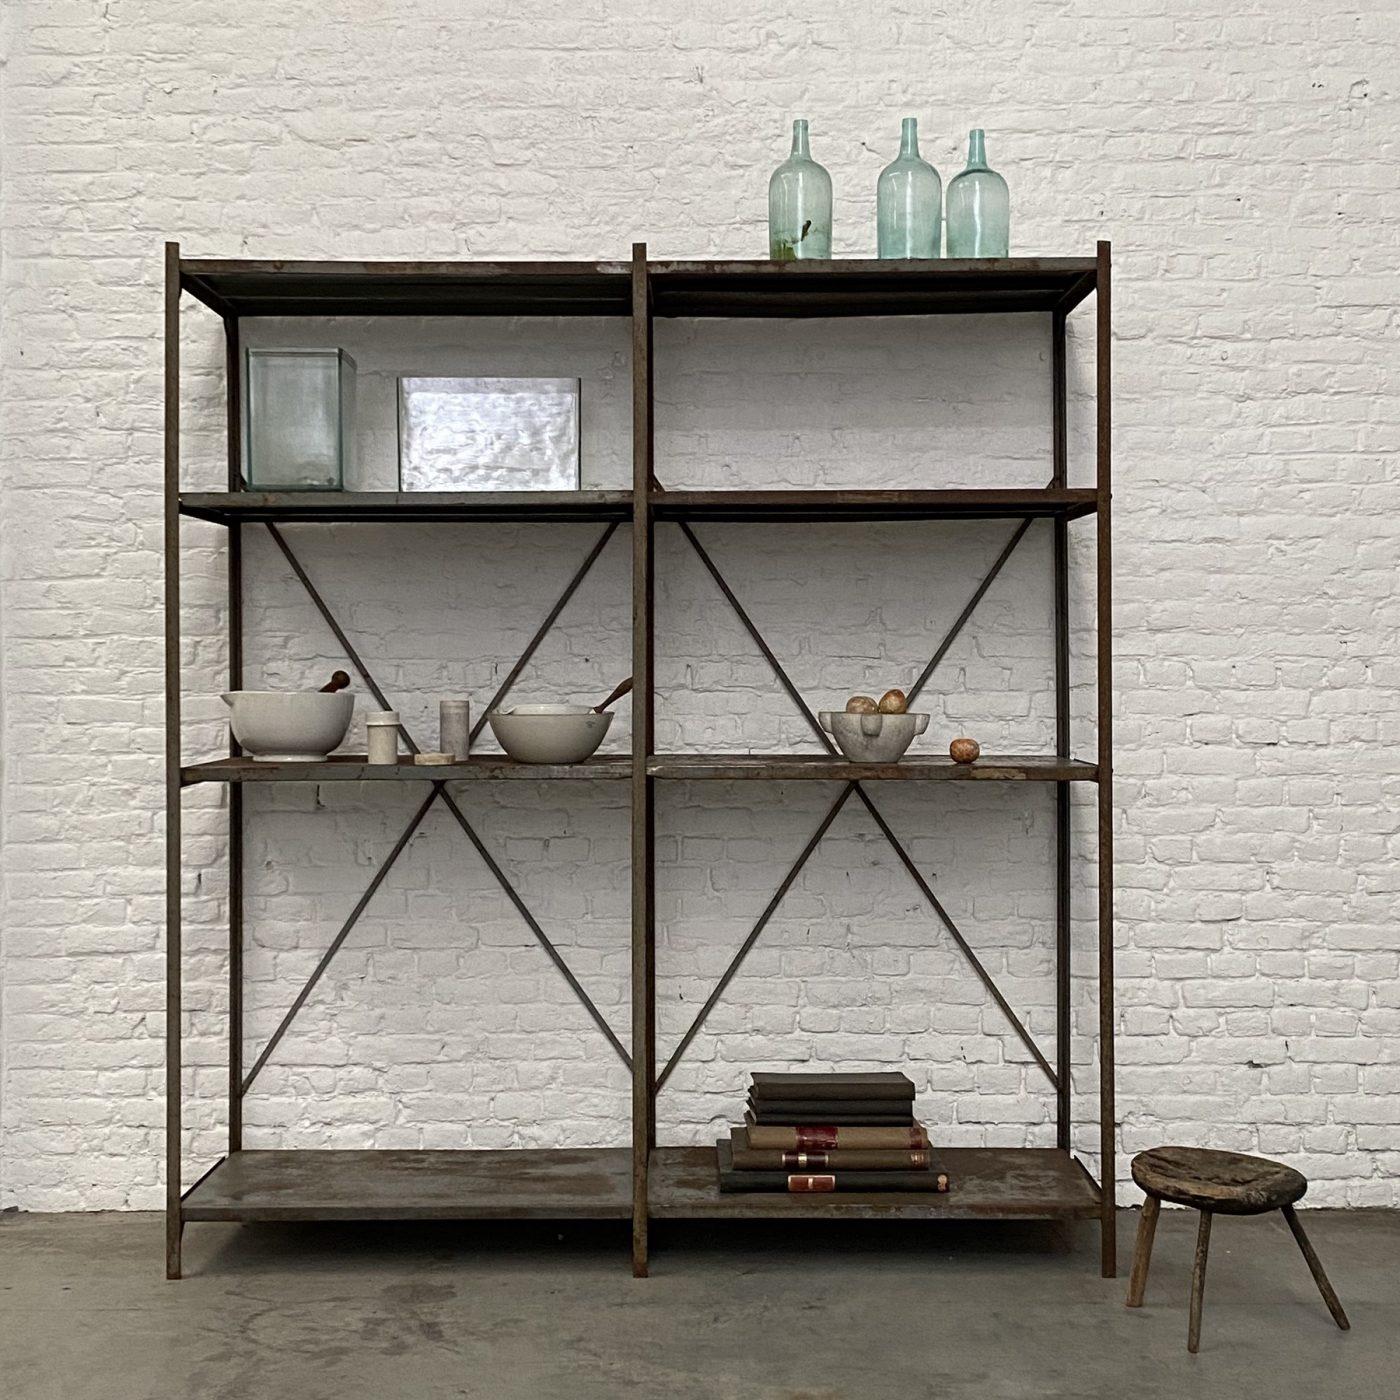 objet-vagabond-industrial-shelf0007